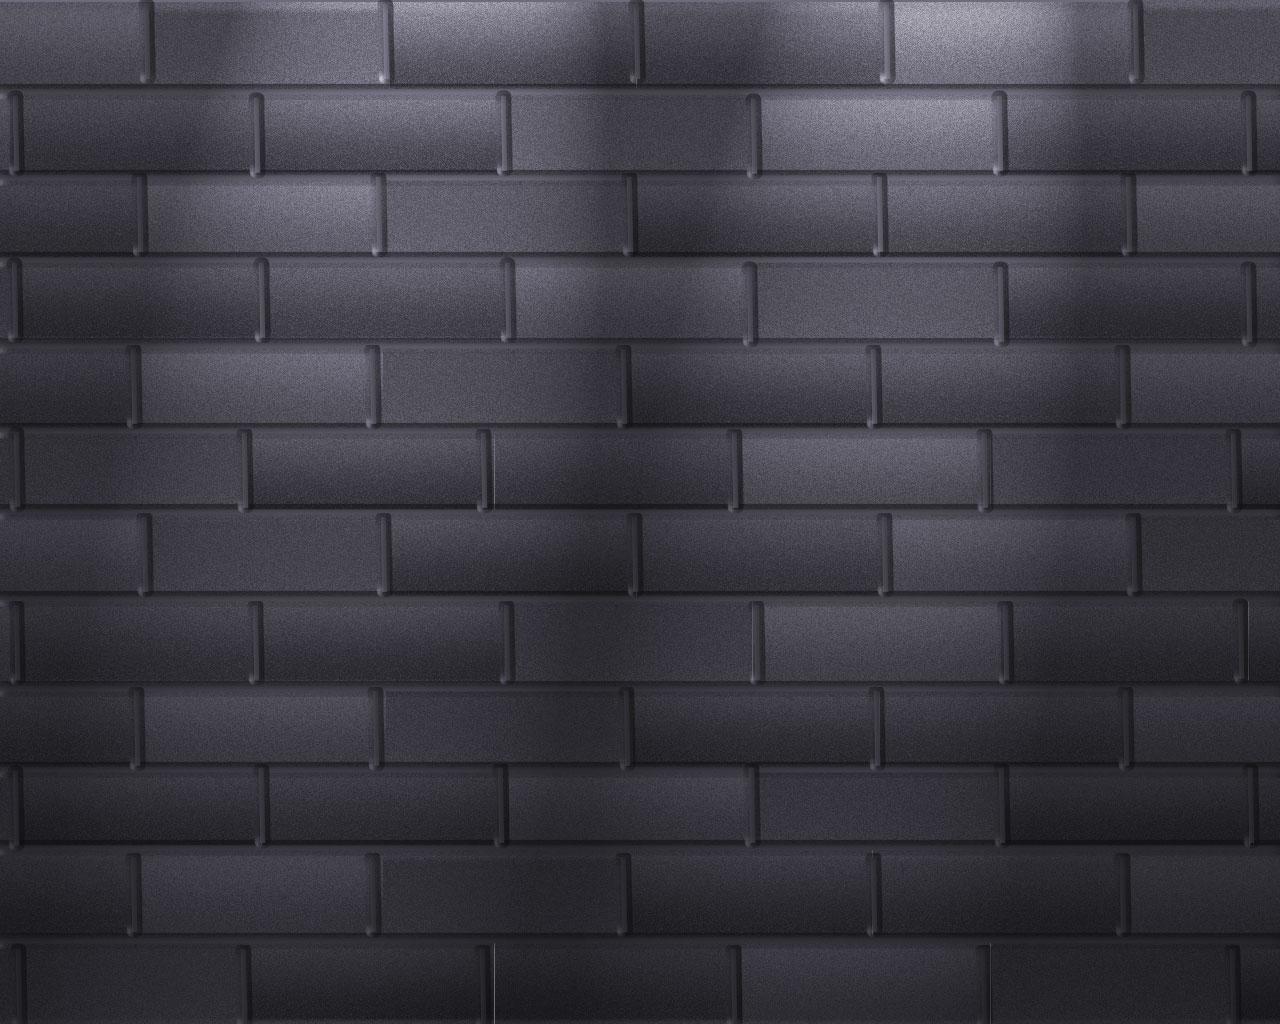 3d wallpapers hd high defination wallpapers. Black Bedroom Furniture Sets. Home Design Ideas